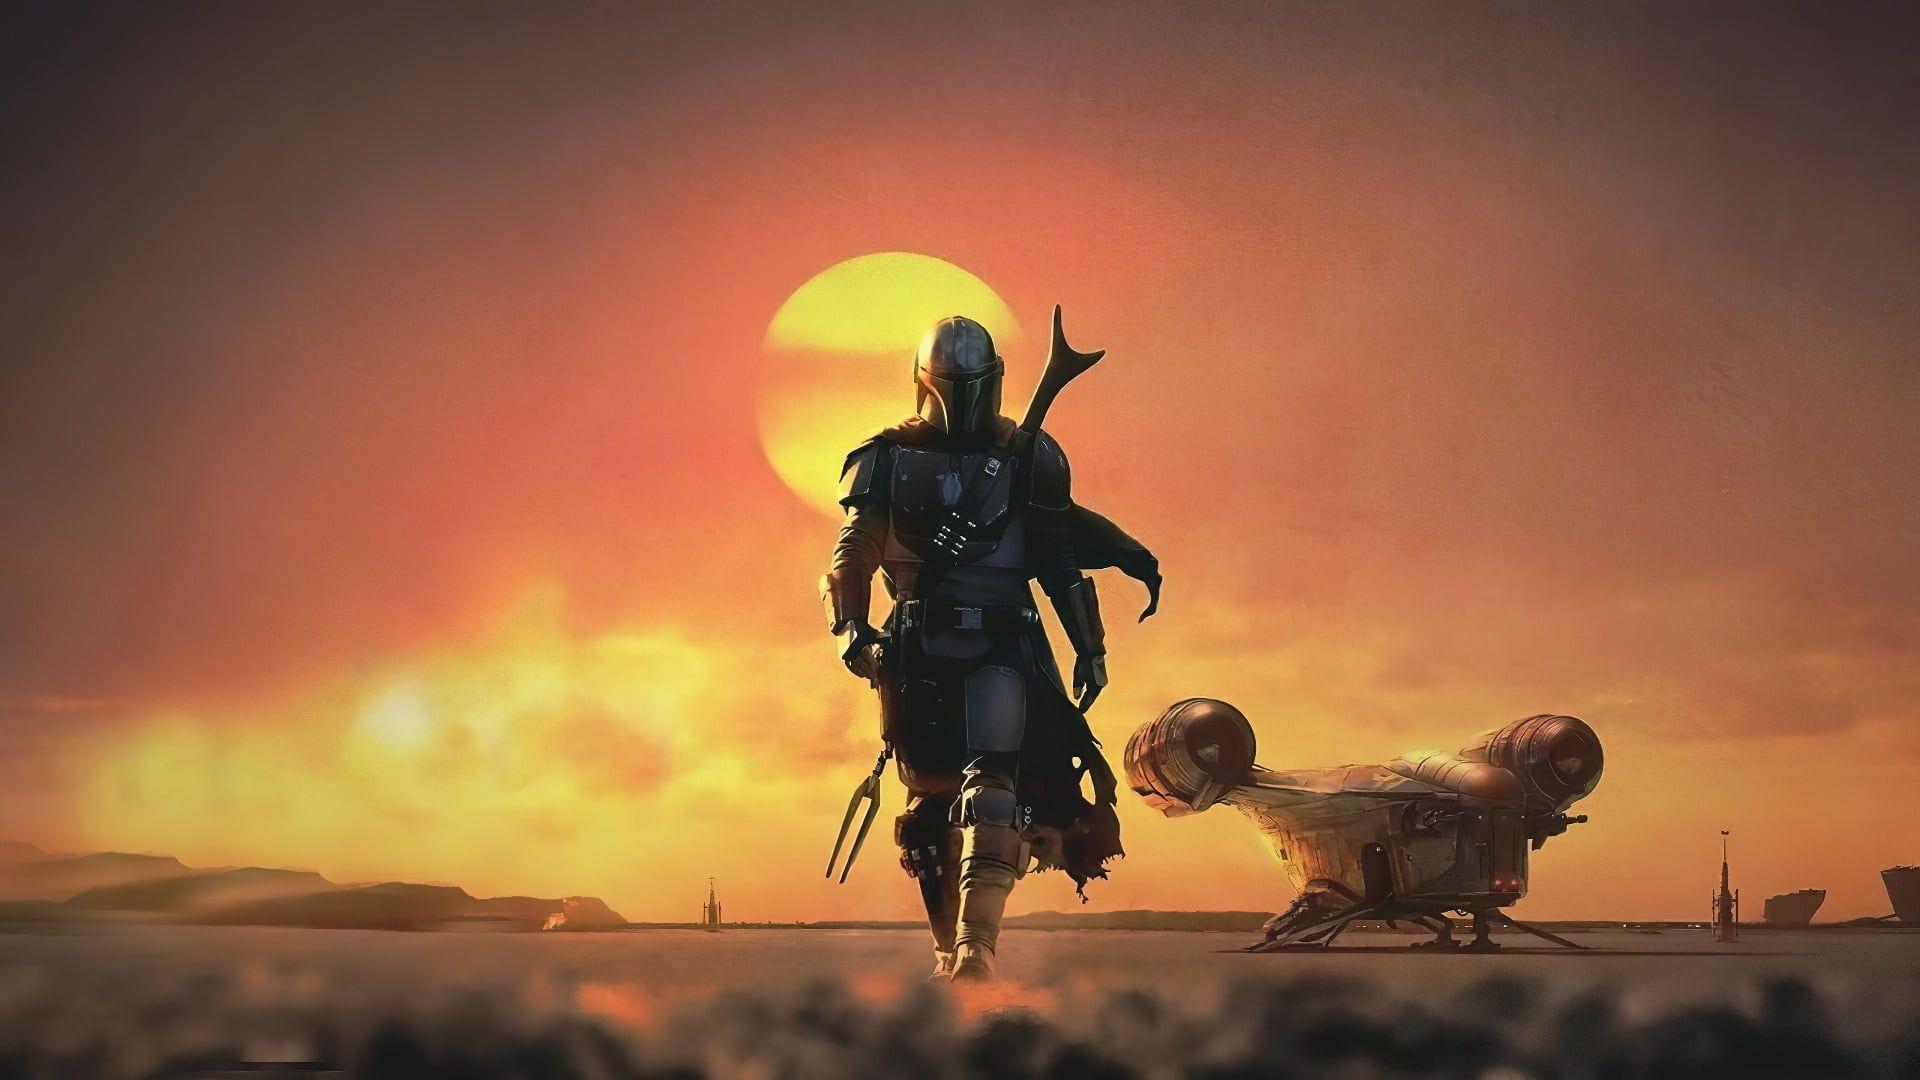 The Mandalorian Star Wars Science Fiction Bounty Hunter 1080p